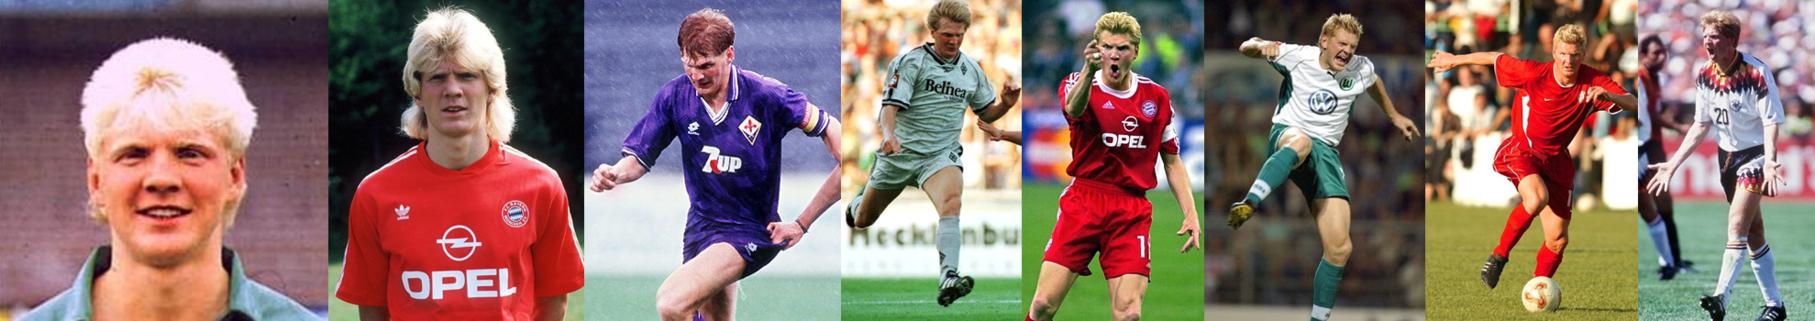 Borussia Mönchangladbach (Part I) - Bayern (Part I) - Fiorentina - Borussia Mönchengladbach (Part II) - Bayern (Part II) - Wolfsburg - Al-Arabi - Allemagne - Click to enlarge